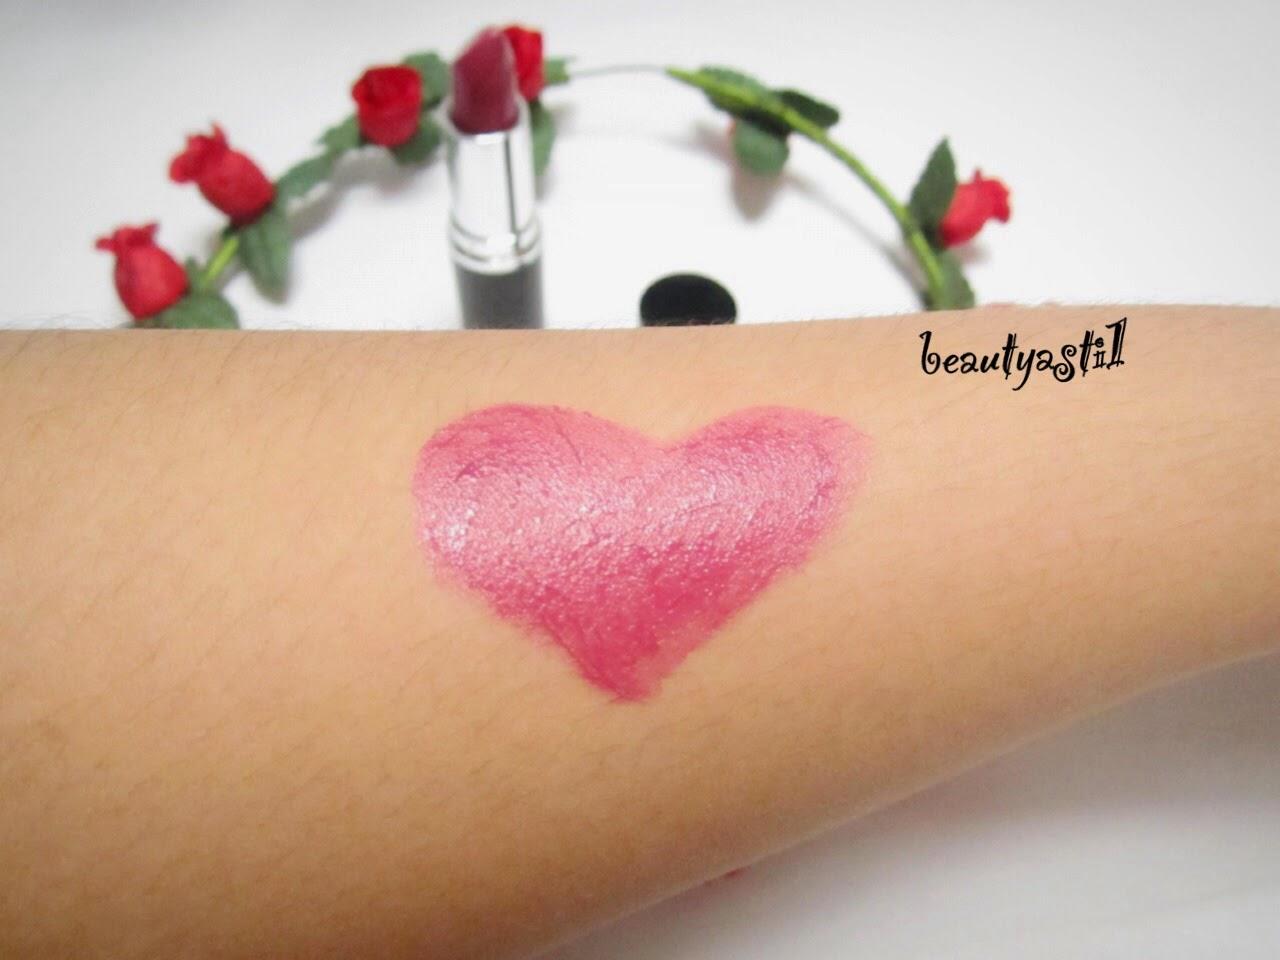 silkygirl-sugar-plum-09-lipstick-swatch.jpg